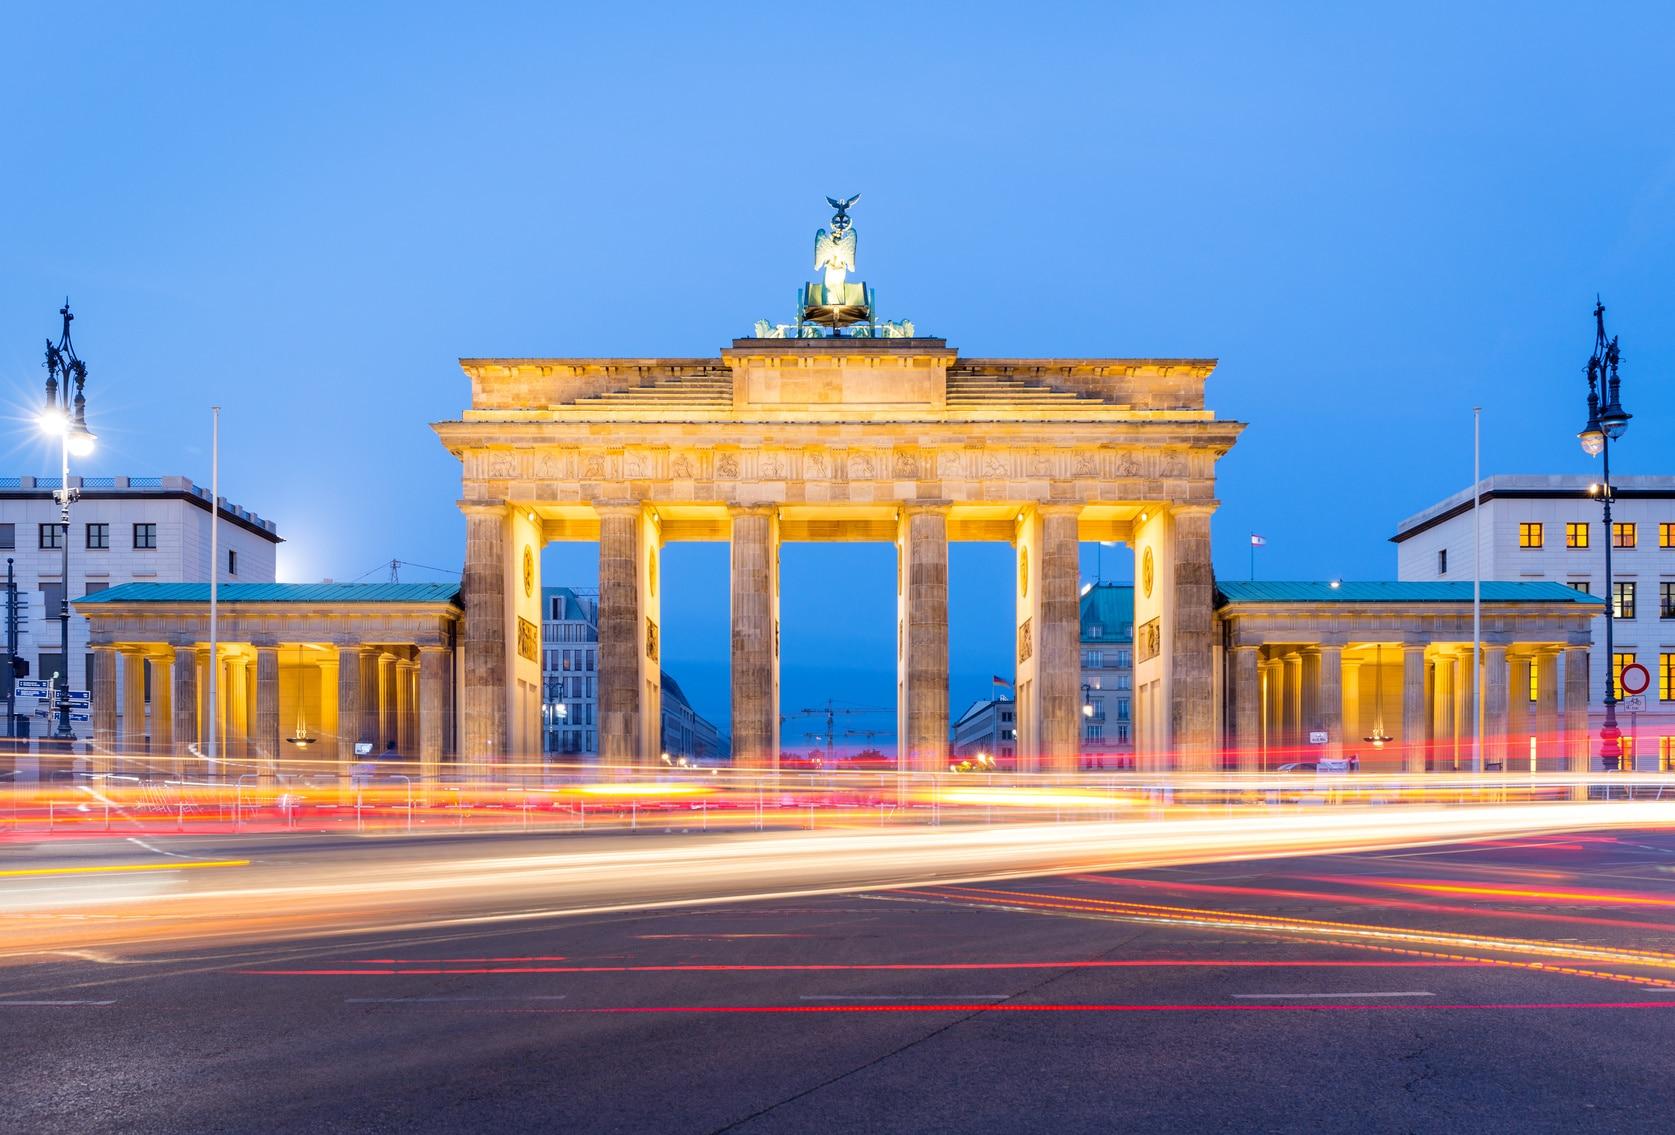 Brandenburger Gate in Berlin in the evening